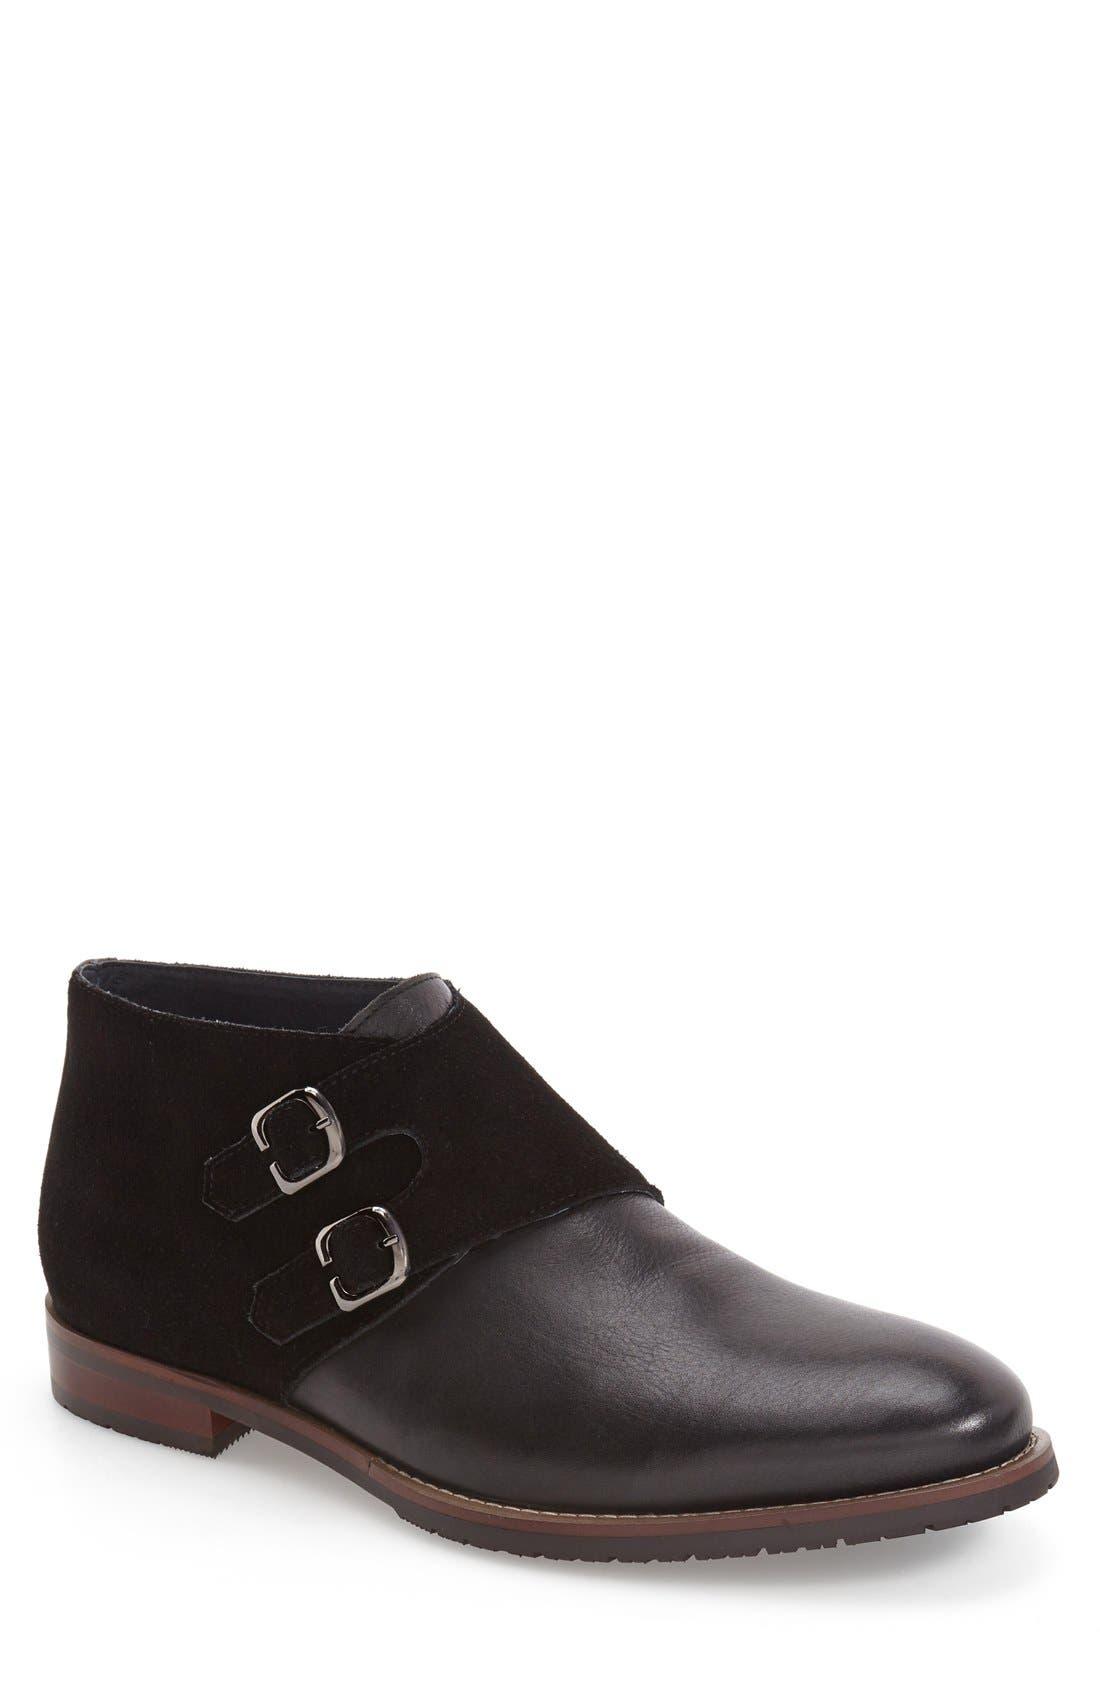 Alternate Image 1 Selected - Zanzara 'Napoli' Double Monk Strap Shoe (Men)